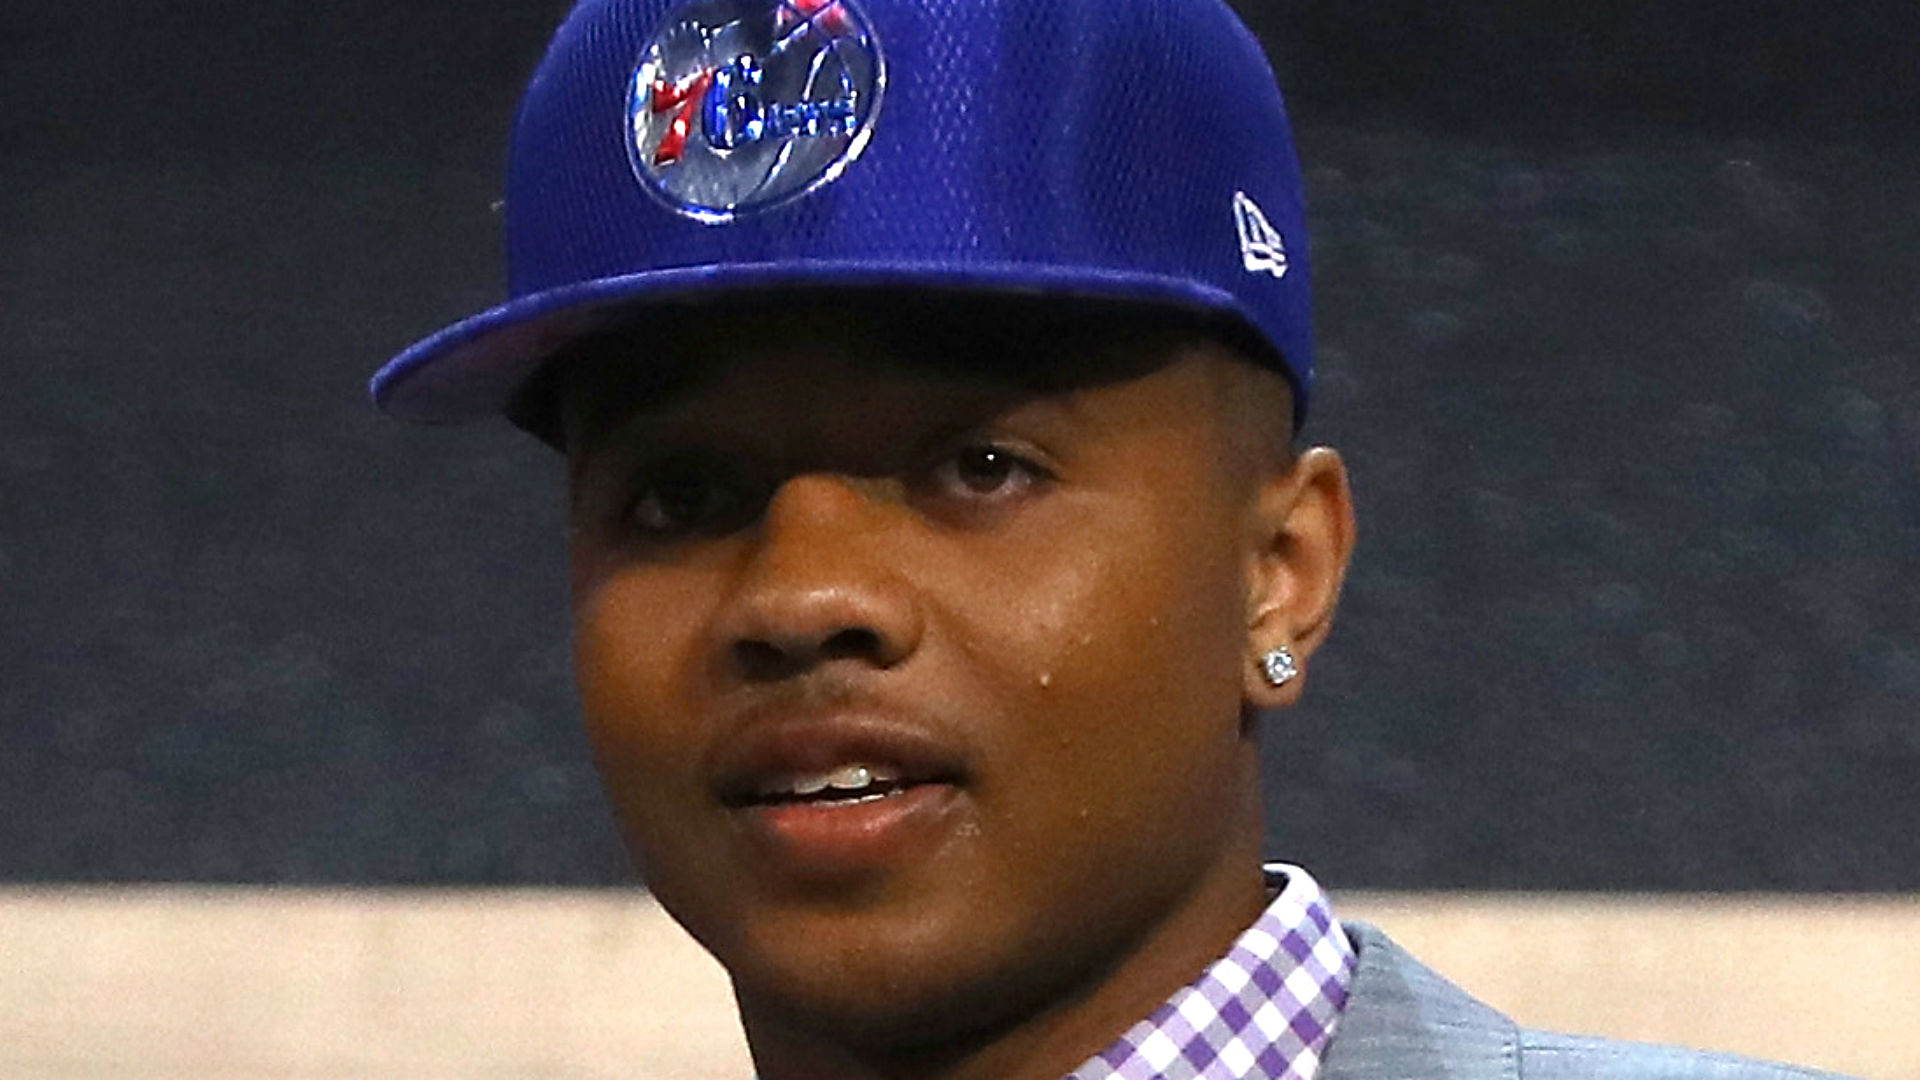 76ers Select Washington G Markelle Fultz No. 1 In NBA Draft